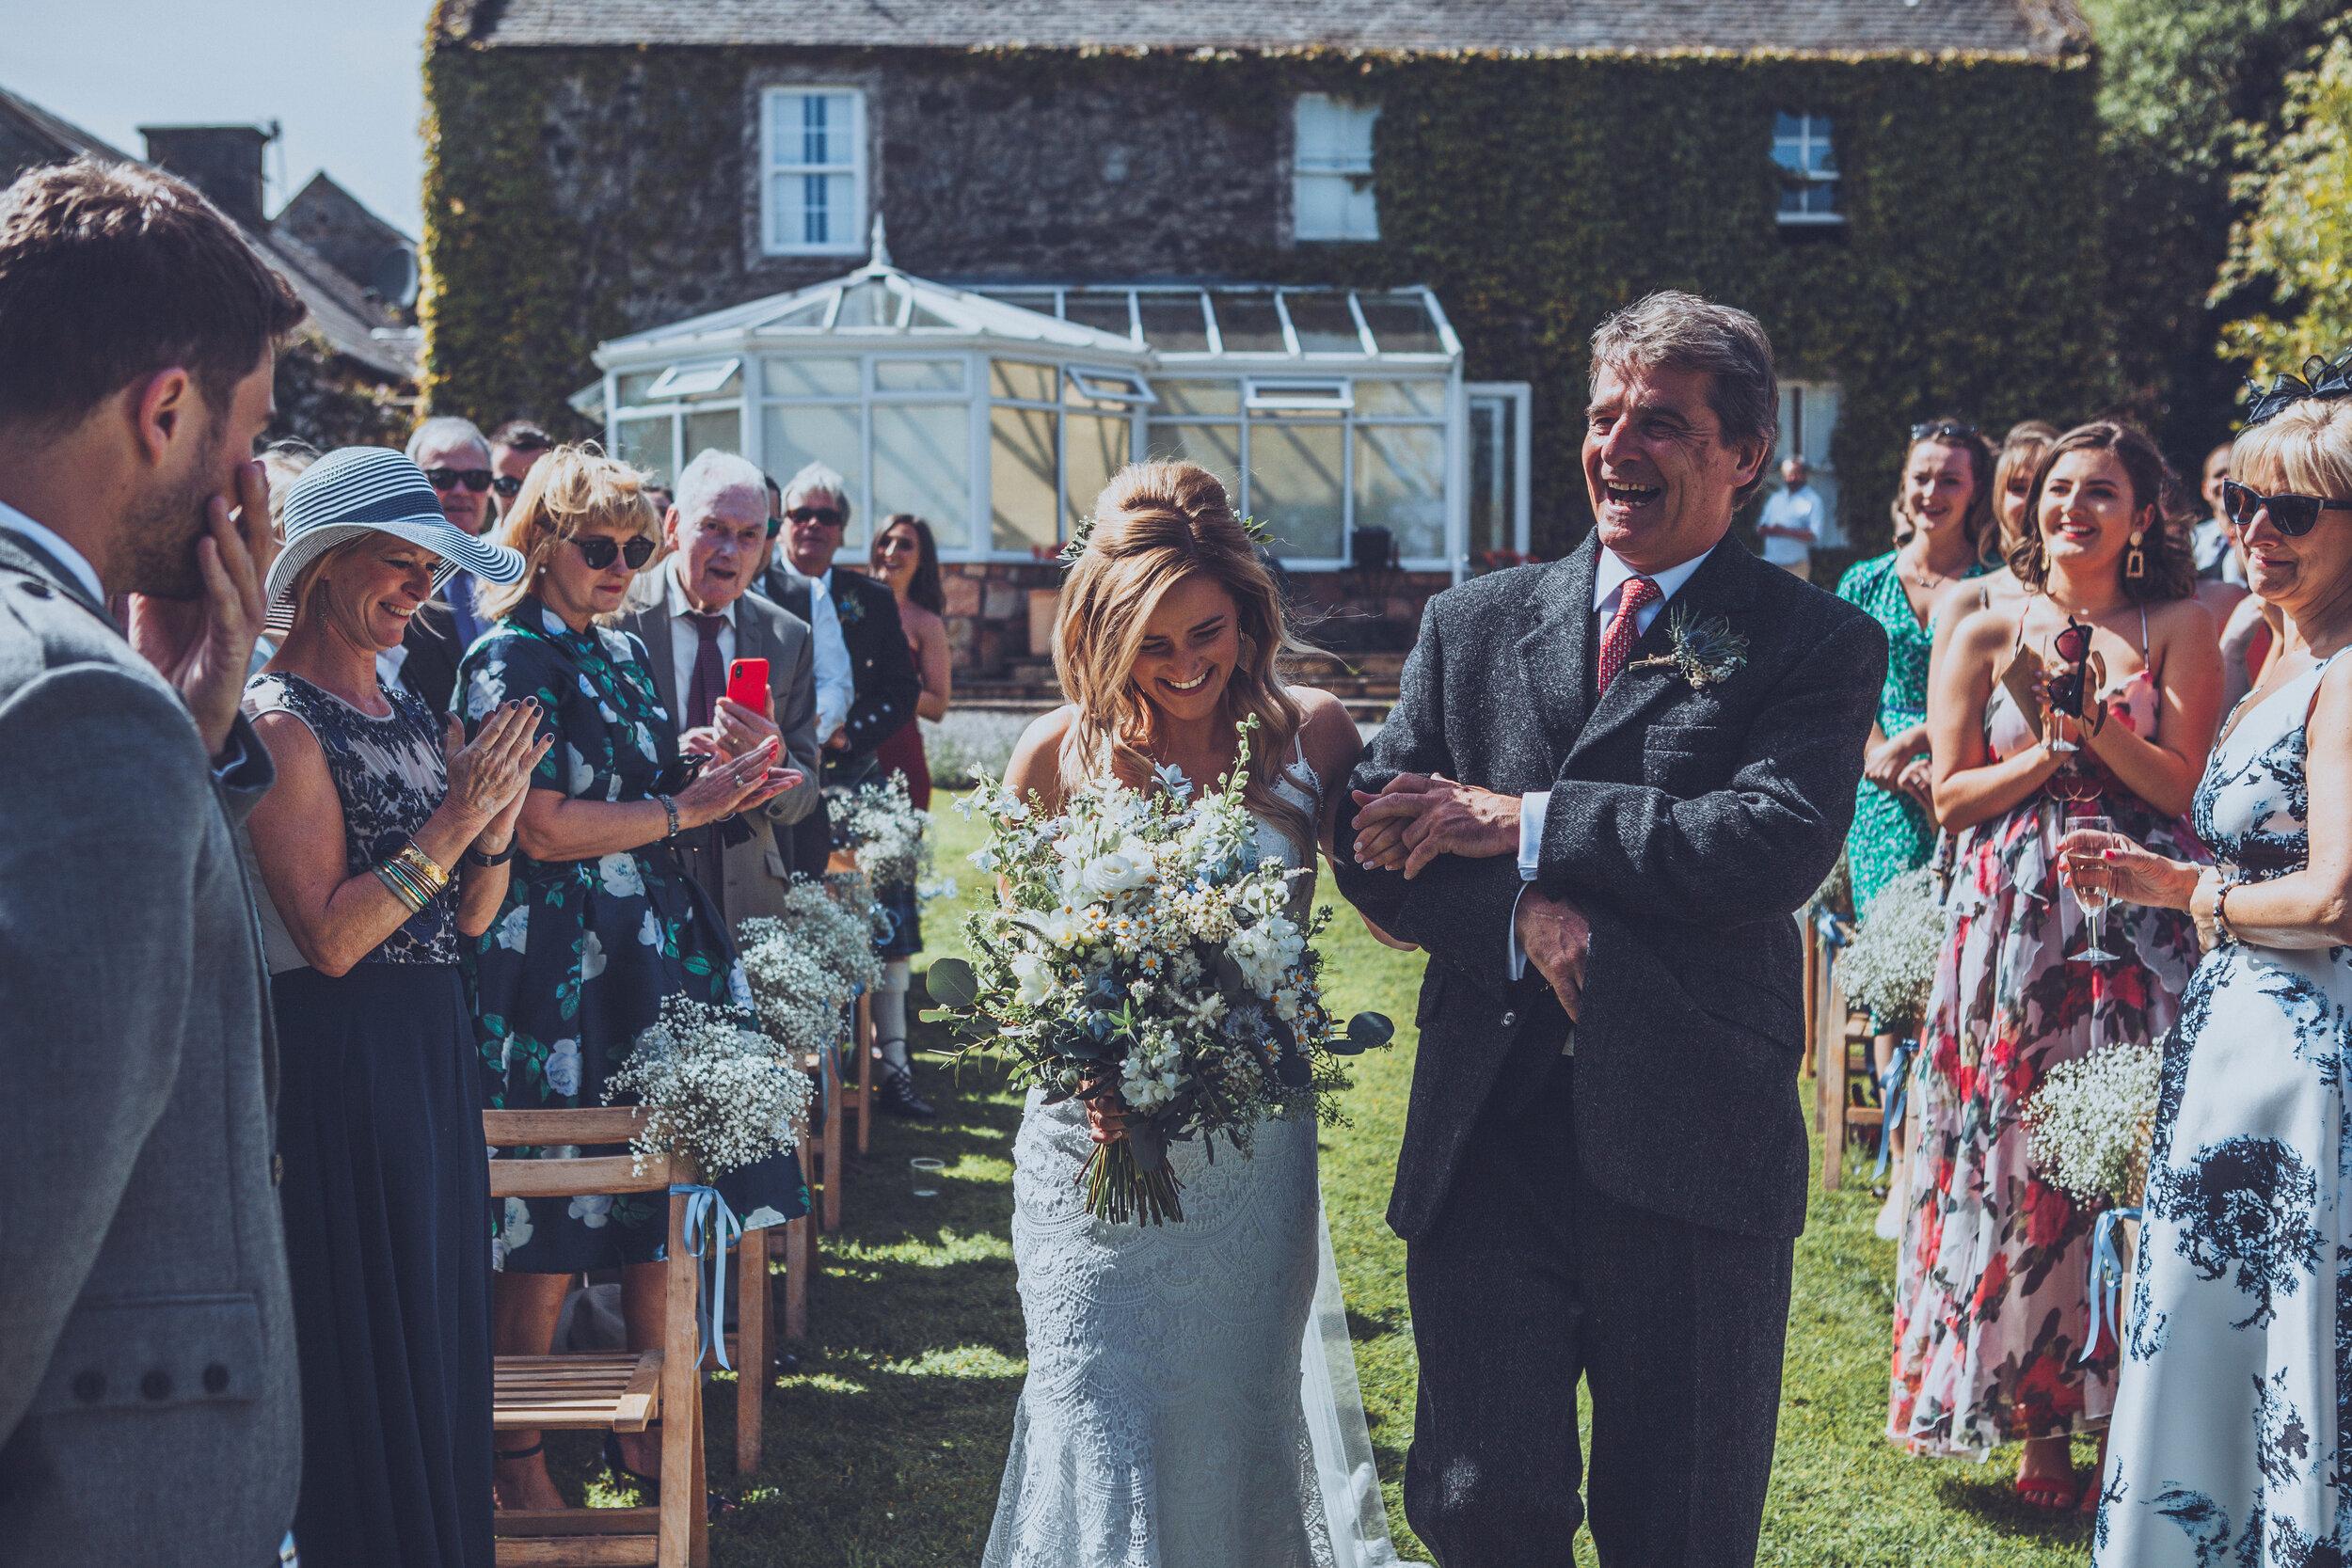 Dalduff Farm Ayrshire Wedding Photography - Claire Basiuk Photographer - 06.jpg